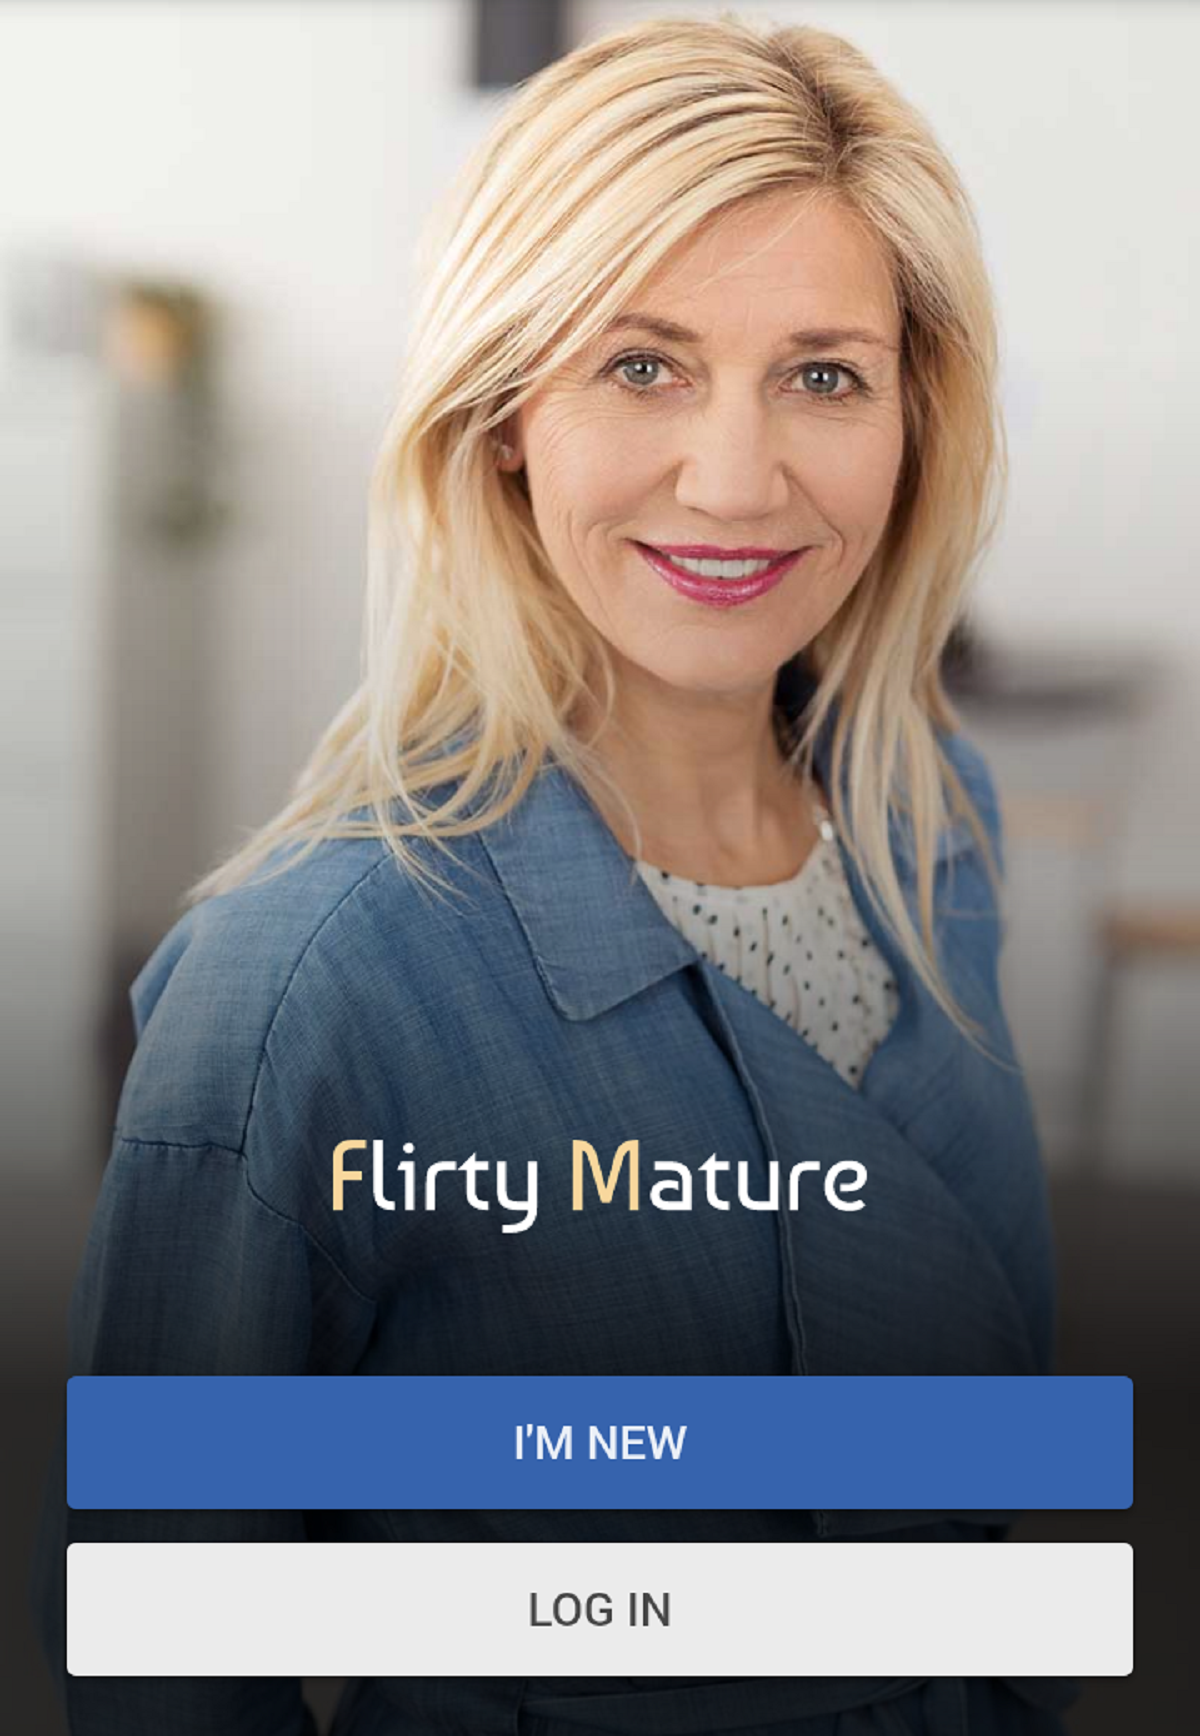 flirtymature mobile